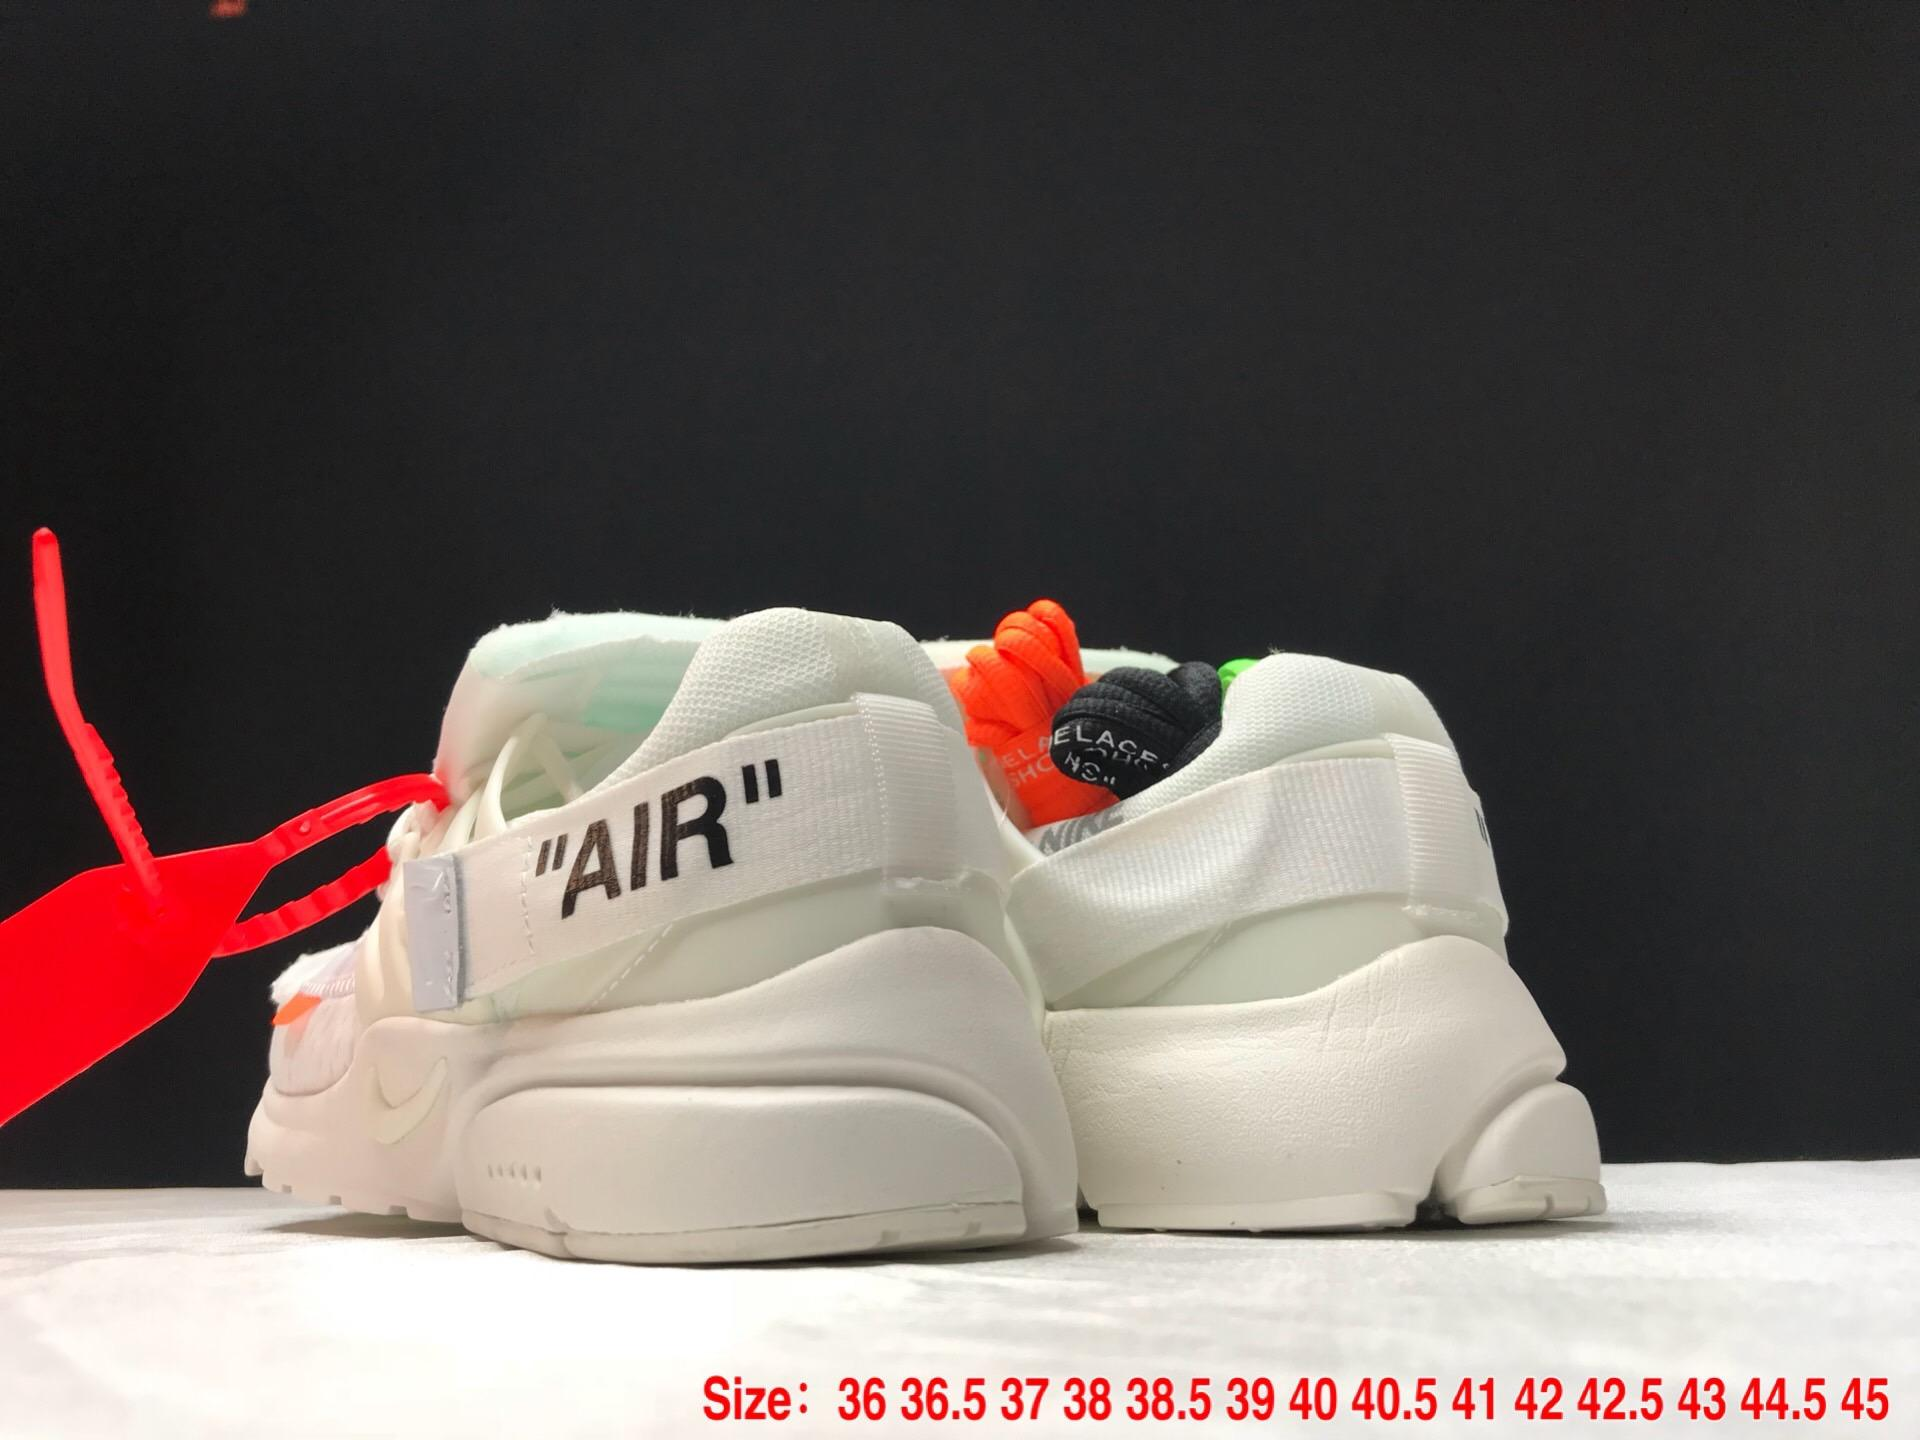 wholesale shoes good quanlity nike air max shoes sport shoes  sneaker shoes